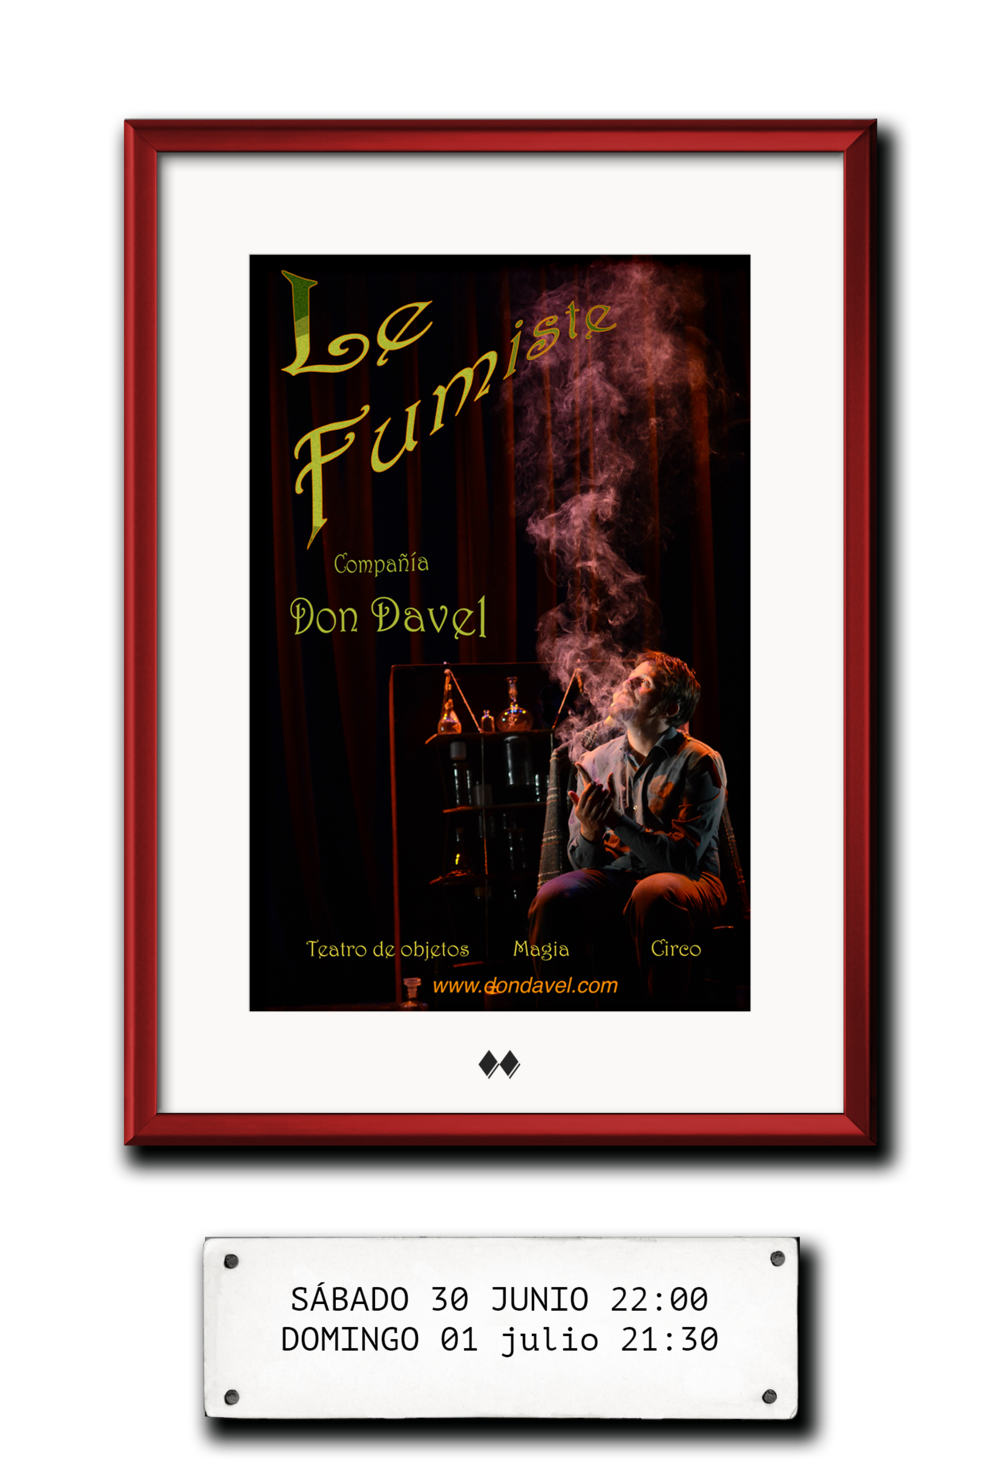 cuadro-fumiste-magia-madrid-circo-clown-teatro-arleuin-gran-via-comprar-entradas.png